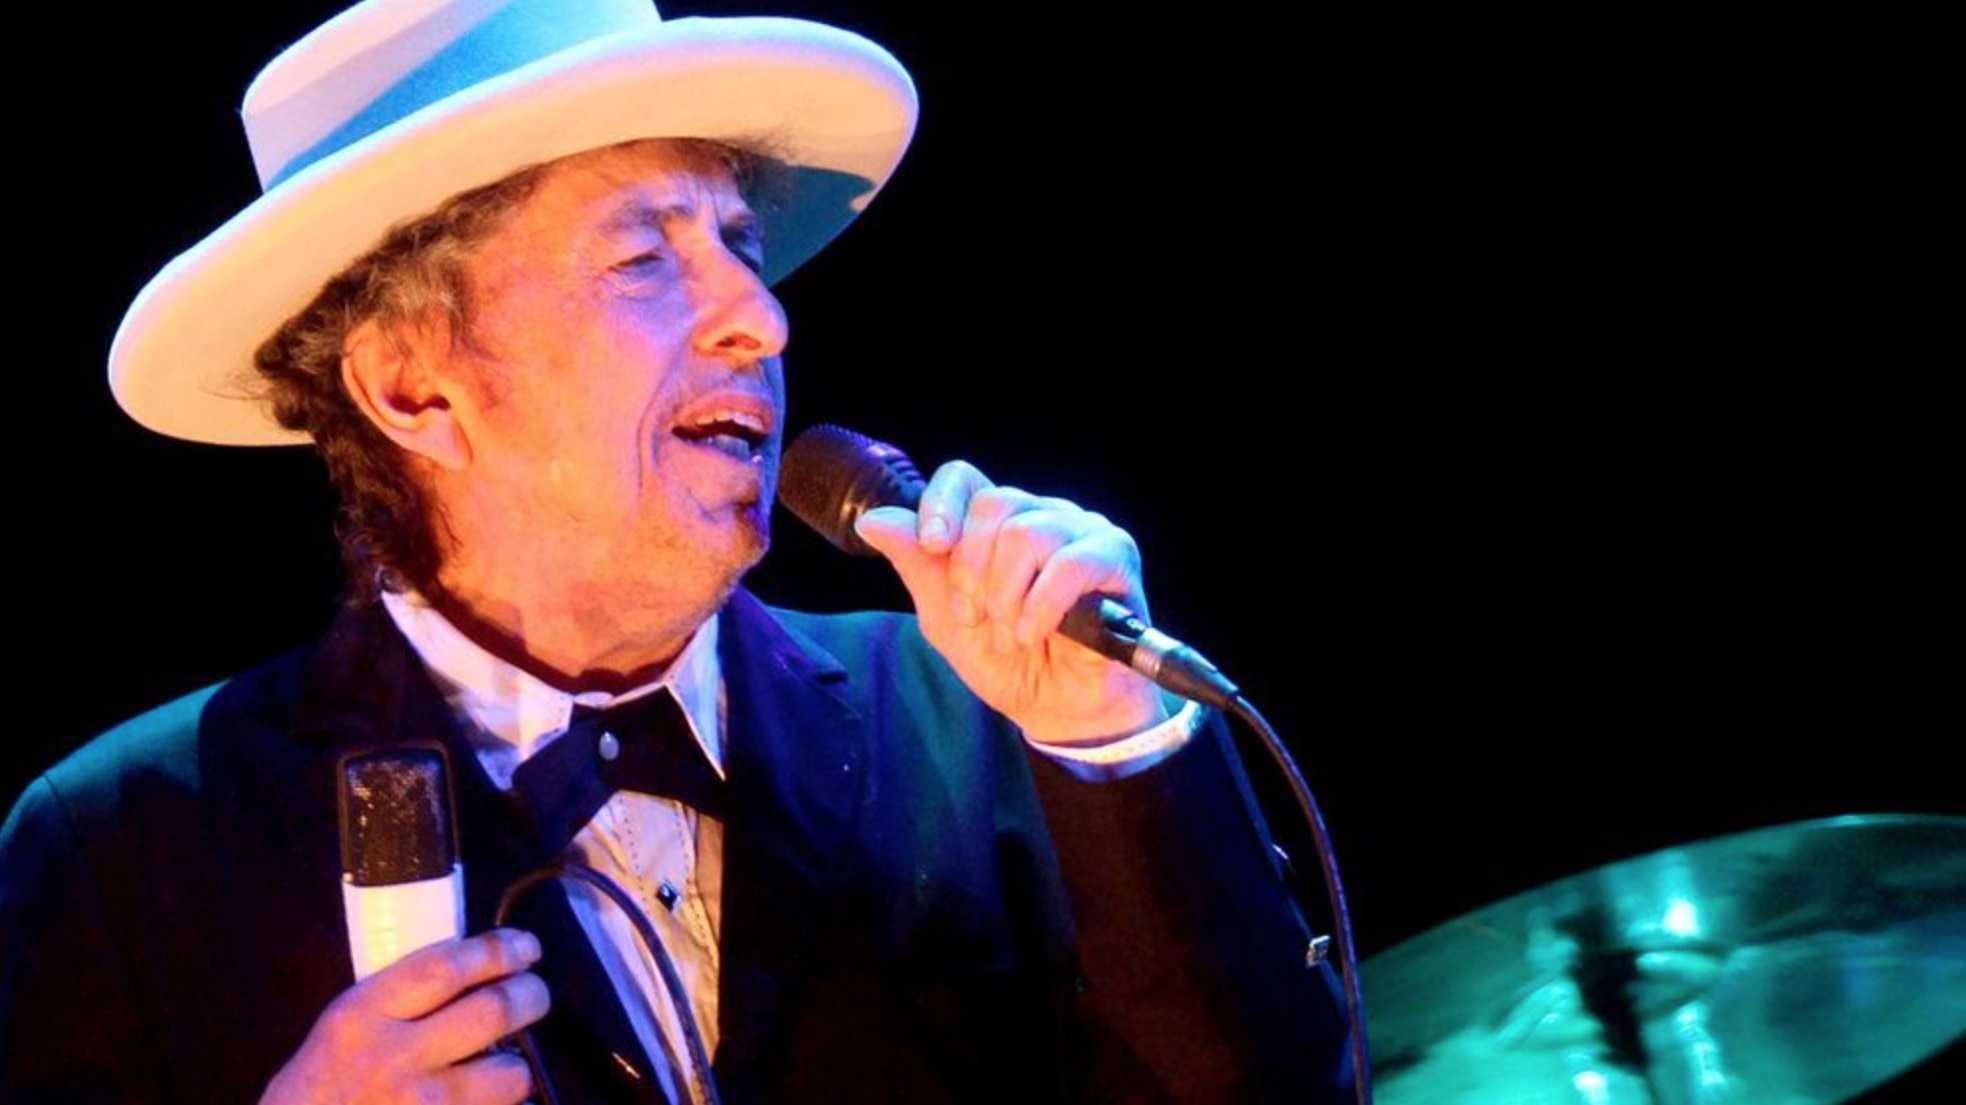 Amazon entwickelt aus Bob Dylans Liedgut TV-Serie